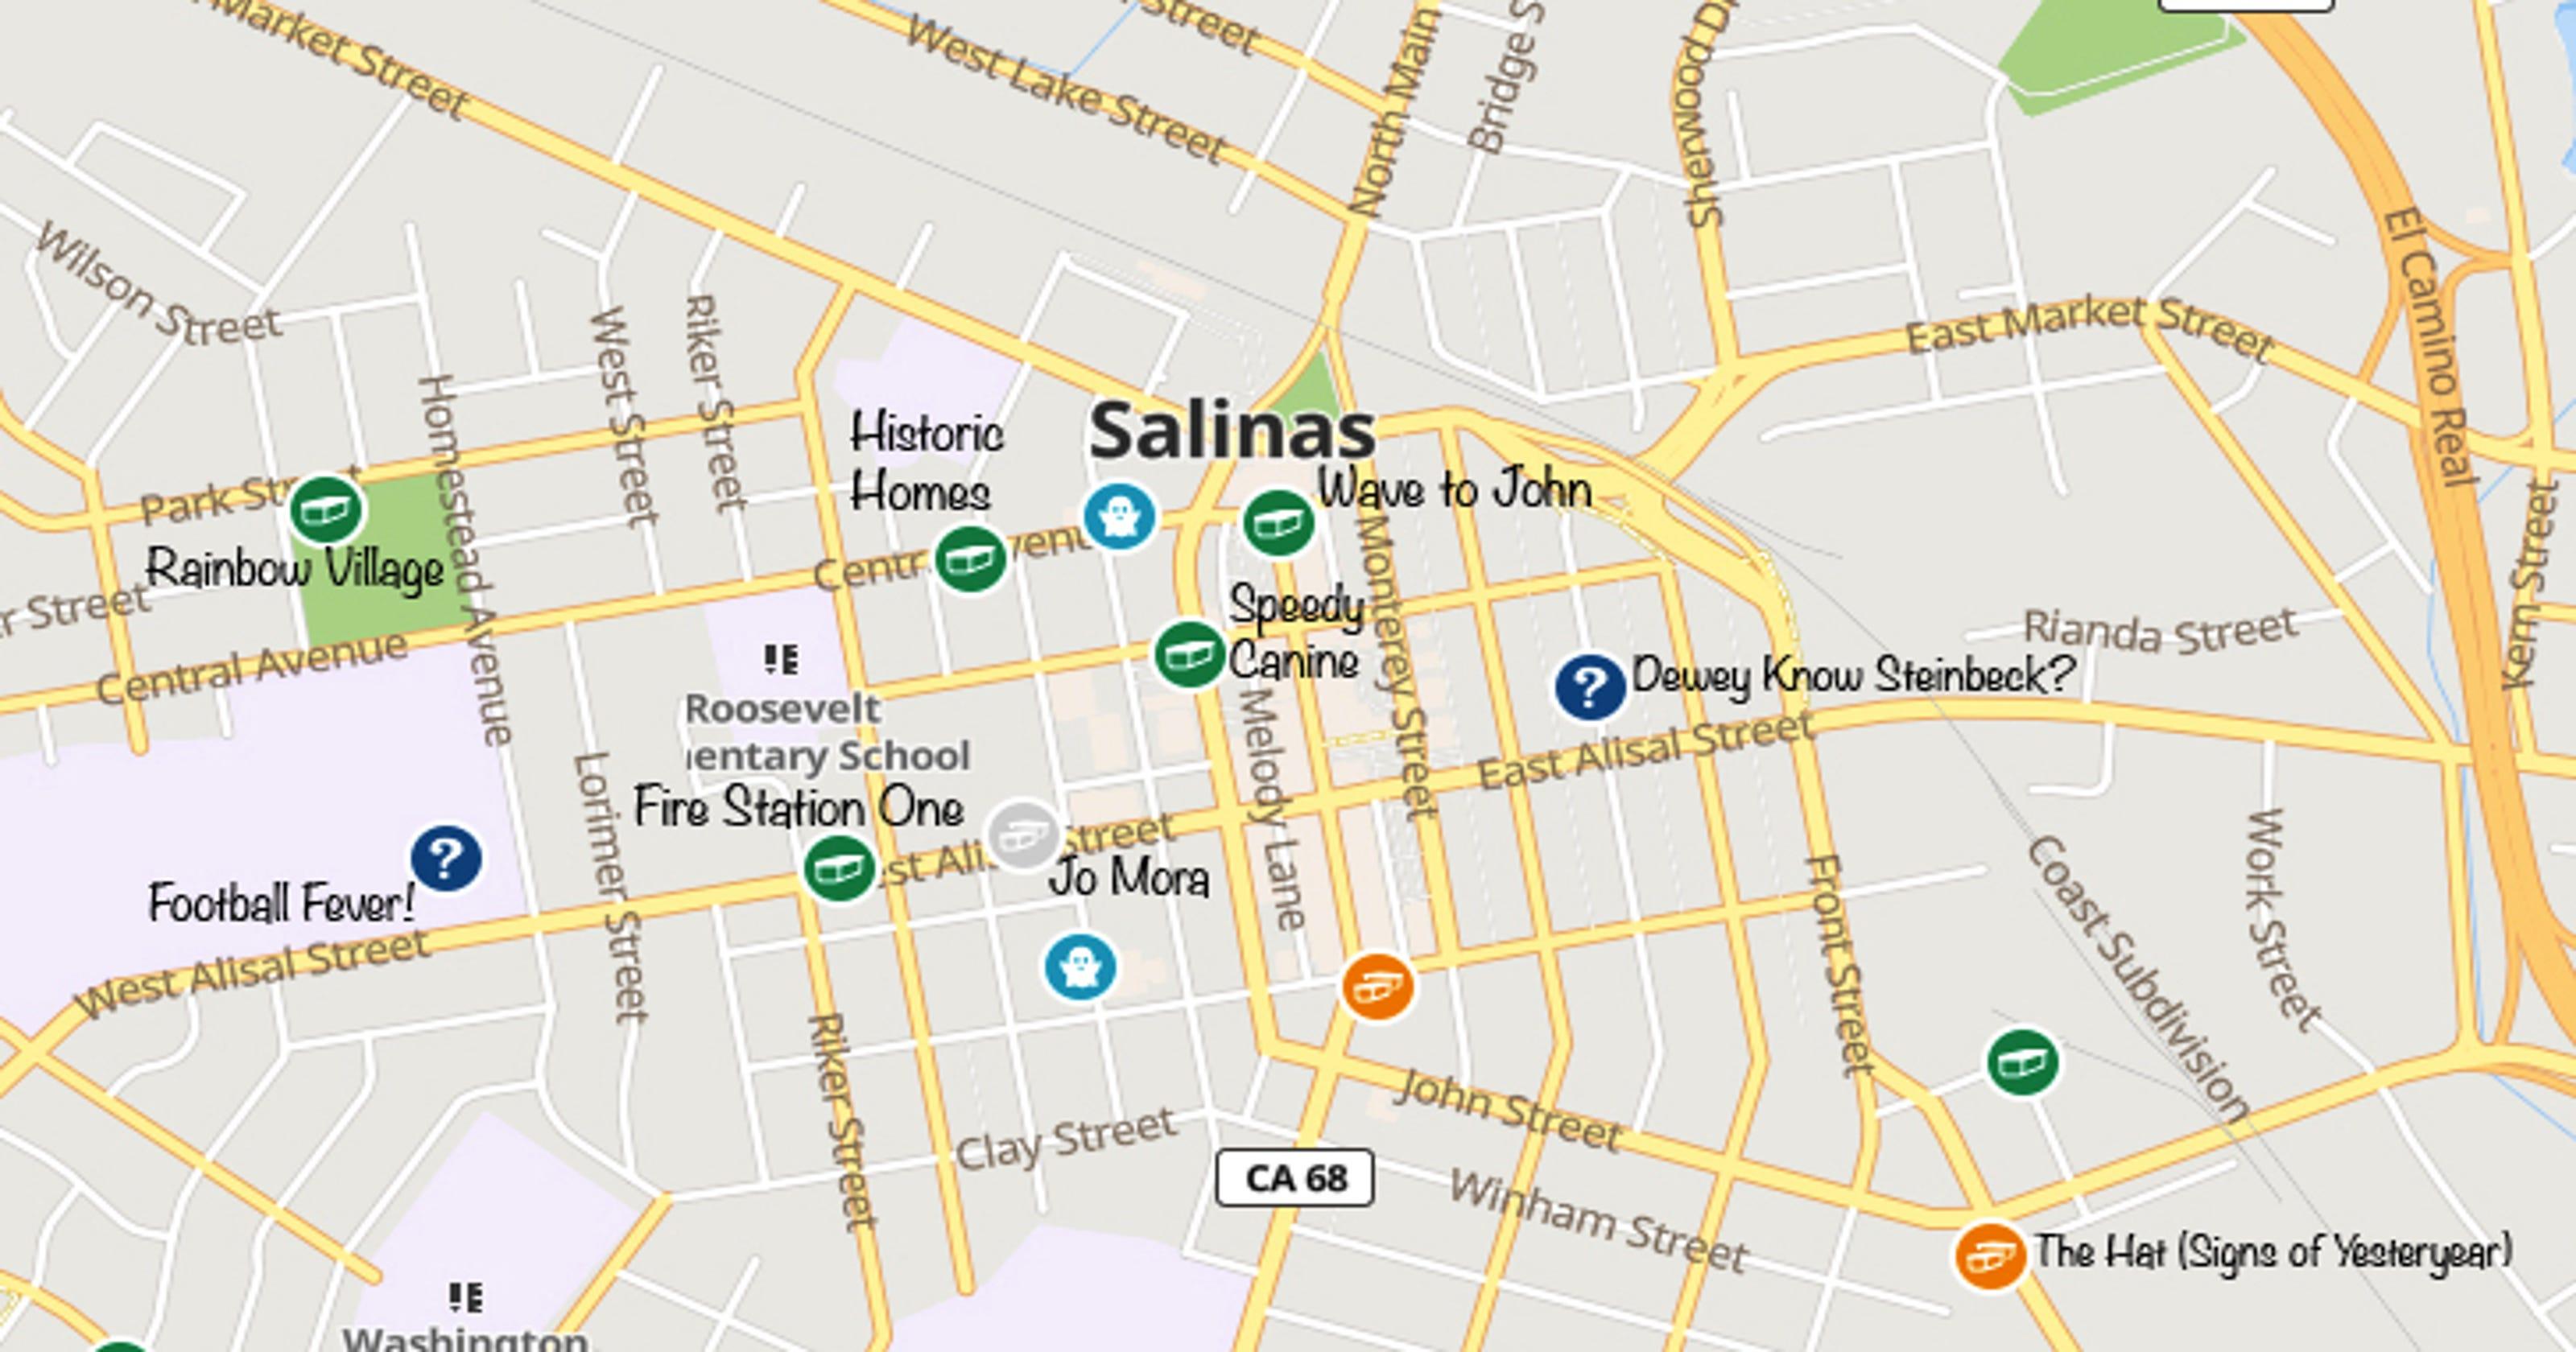 Hometown treasure on san diego county zip map, geocaching utah map, cache map, waypoint map,